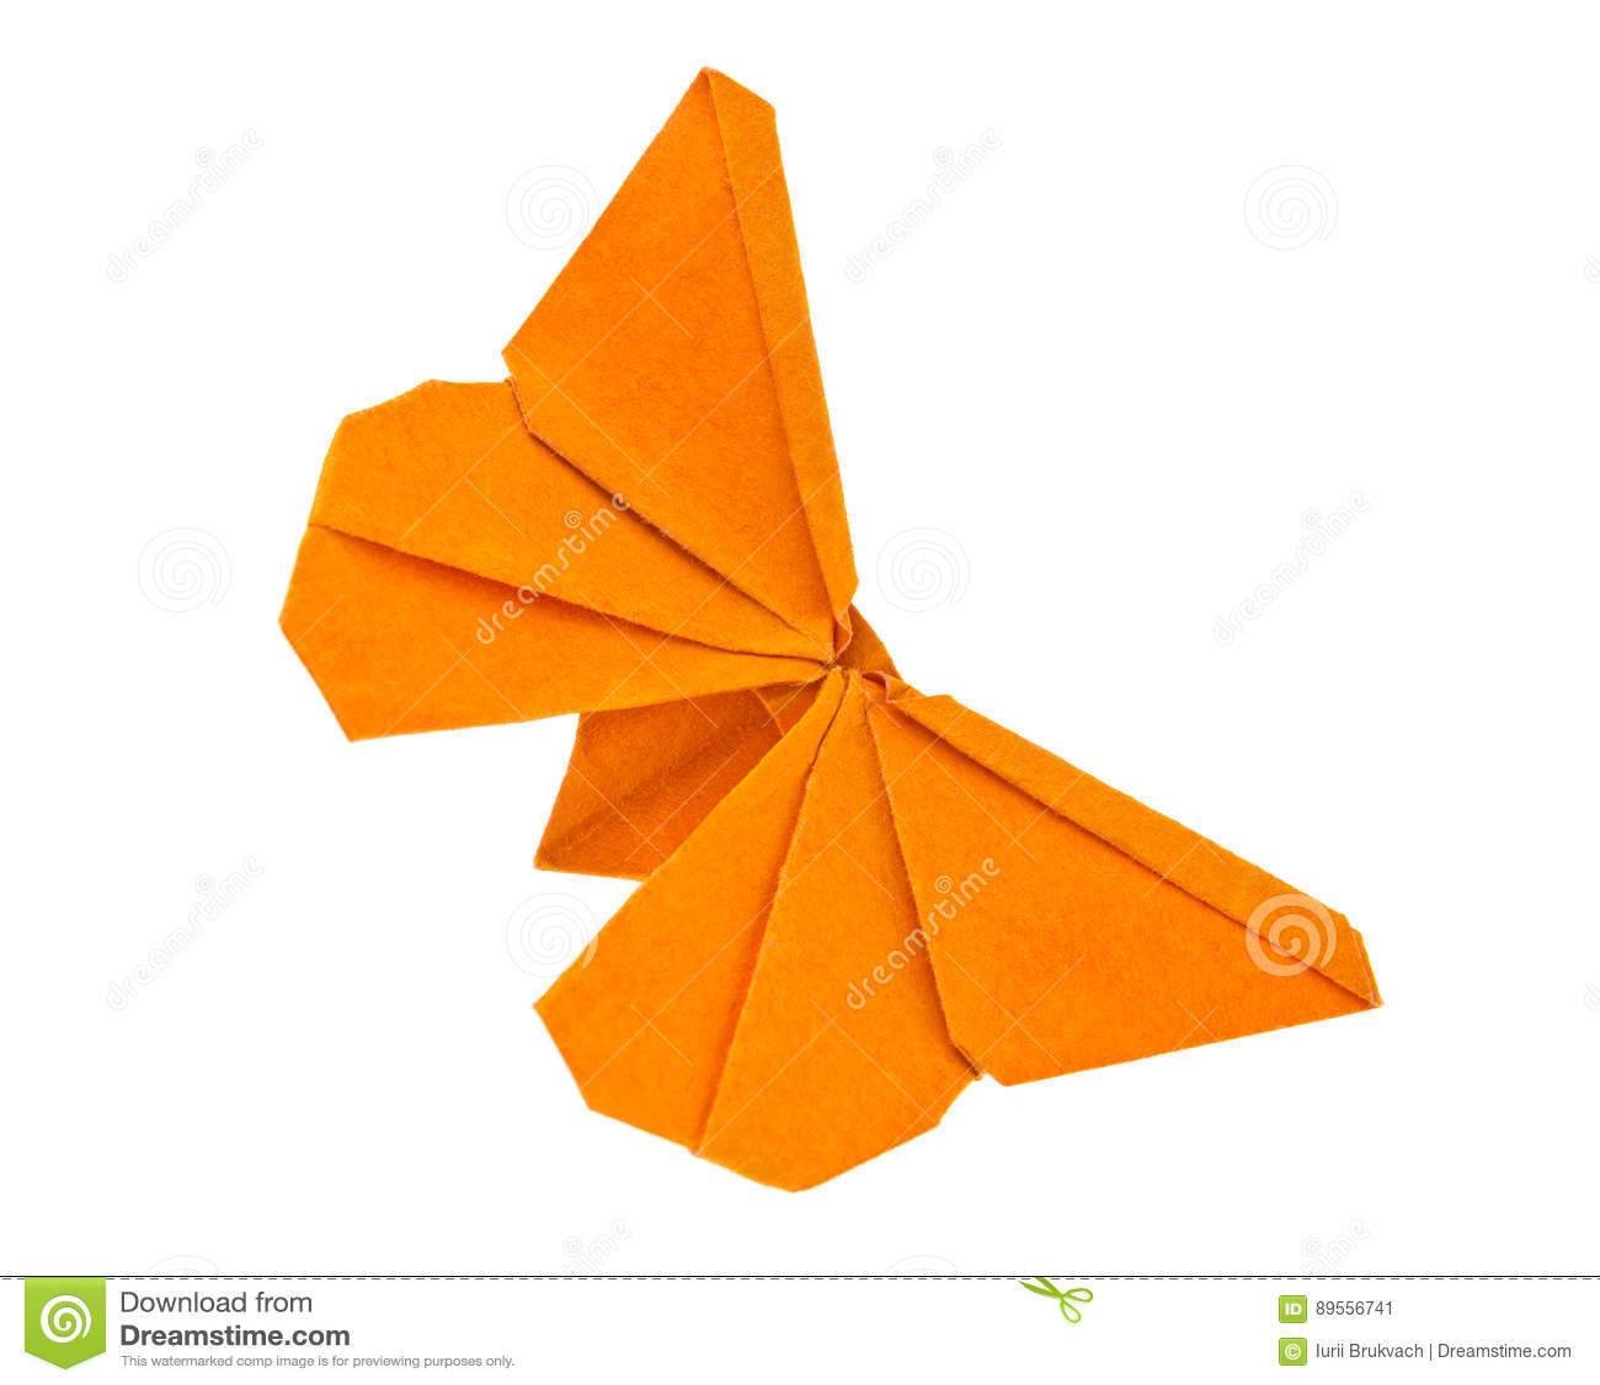 Origami橙色蝴蝶